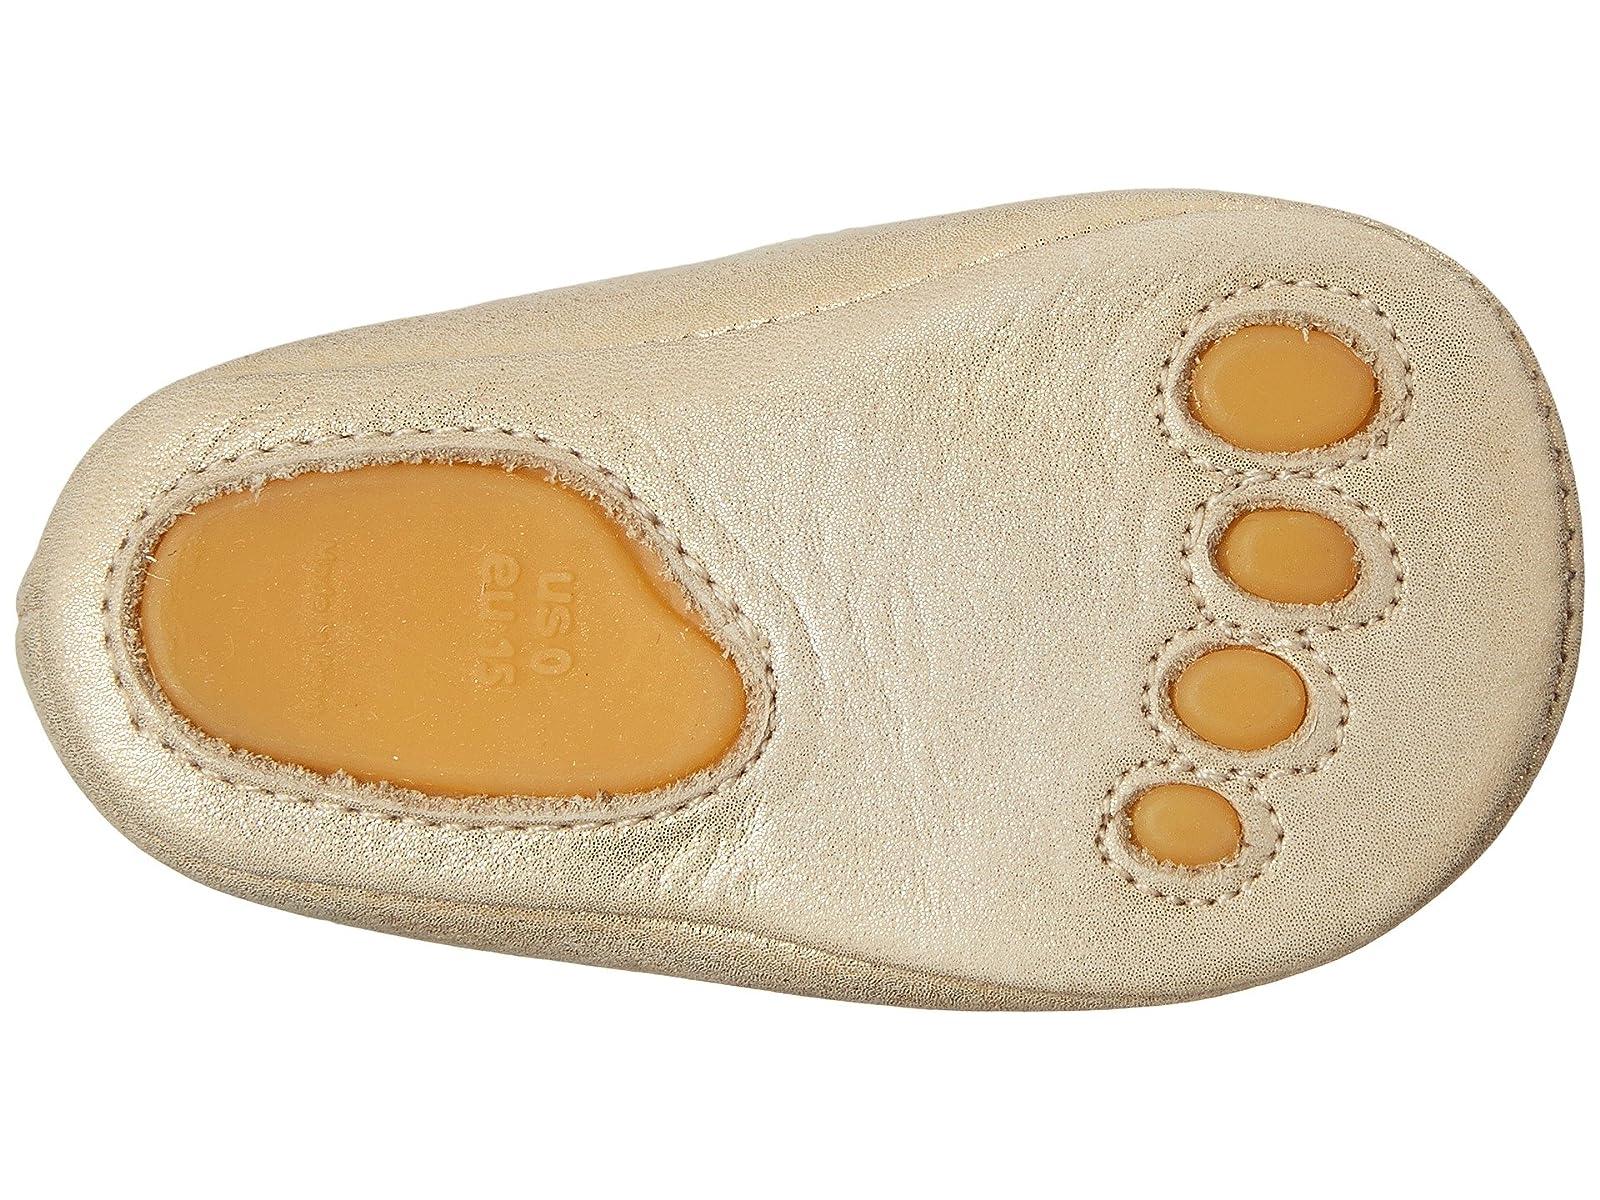 prix de vente: m. / mme: elephantito bébé sleepers toddler) (infant / toddler) sleepers 74343b